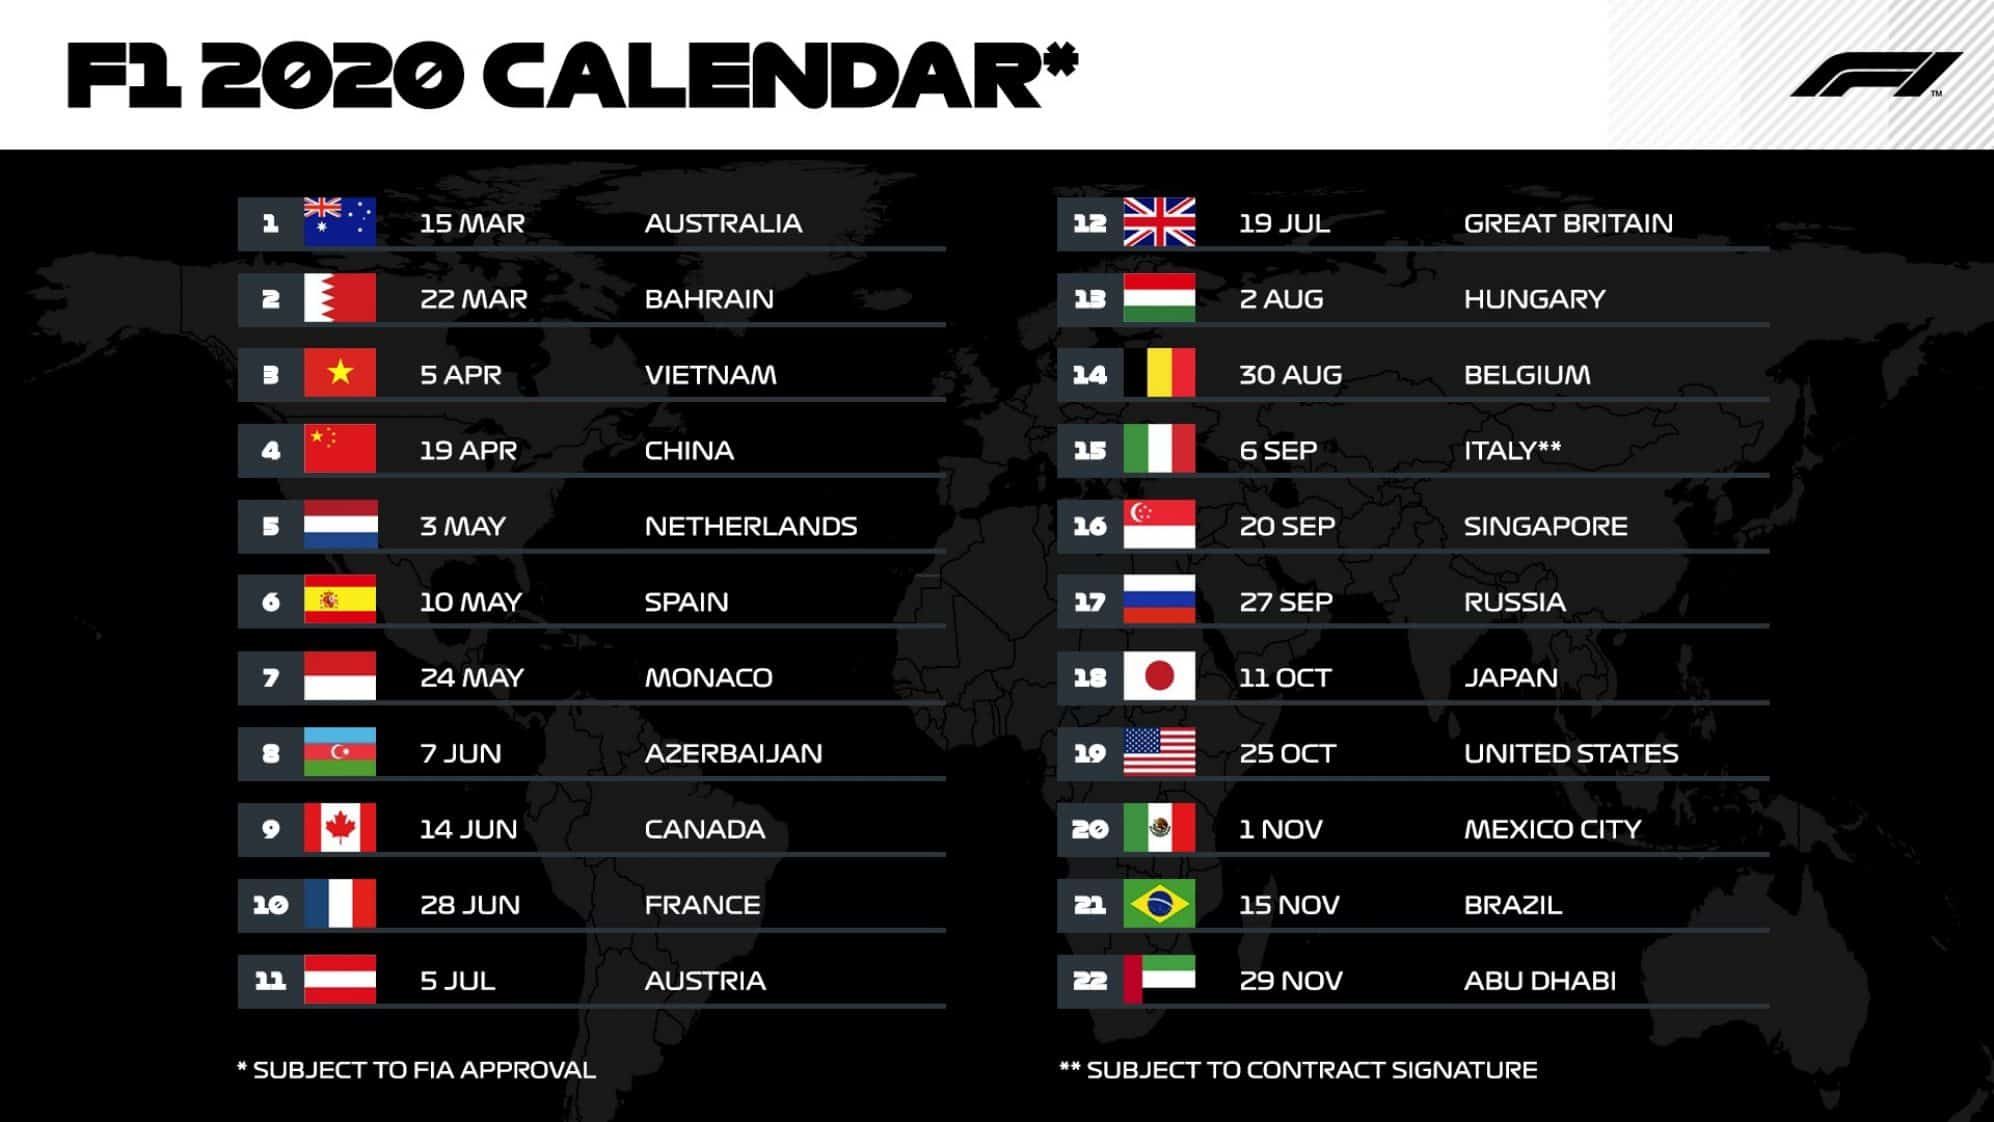 Calendario Formula 1 2020: Date e orari Diretta TV dei Gran Premi